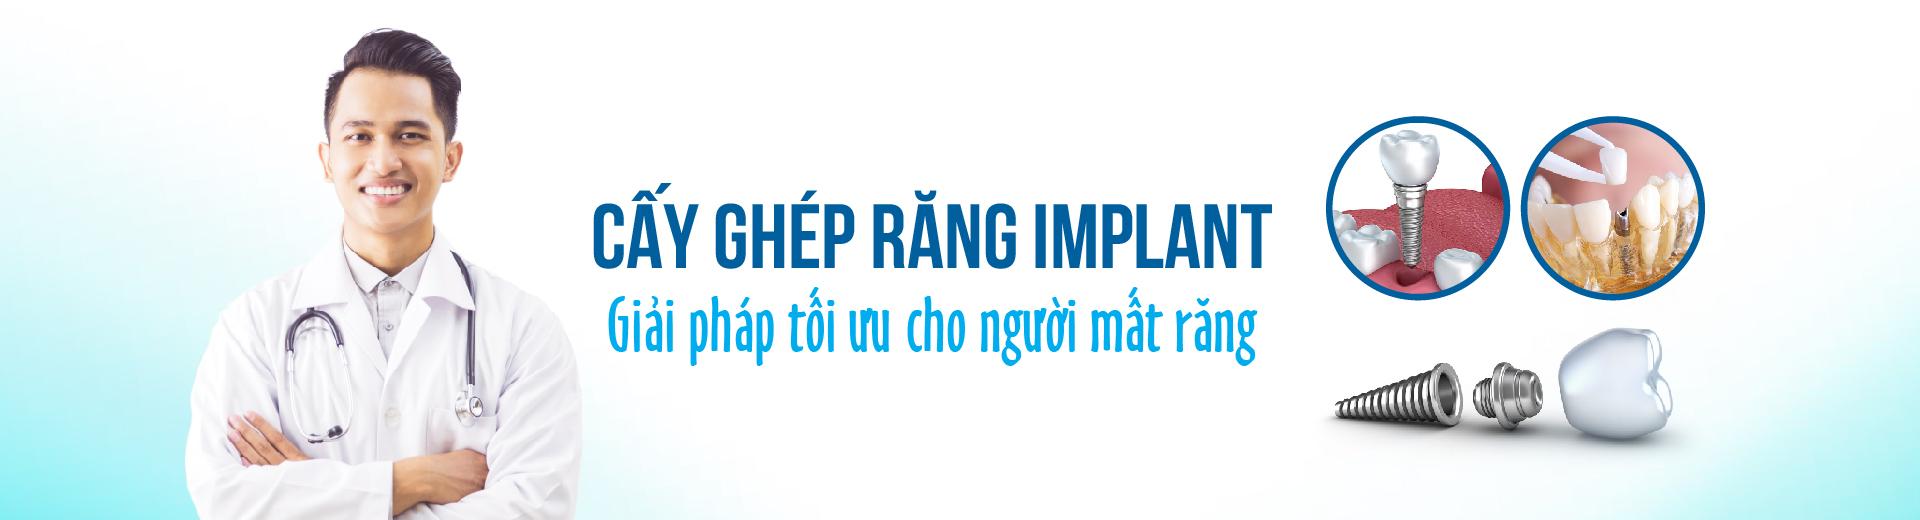 Trồng răng implant tại Nha khoa Kim